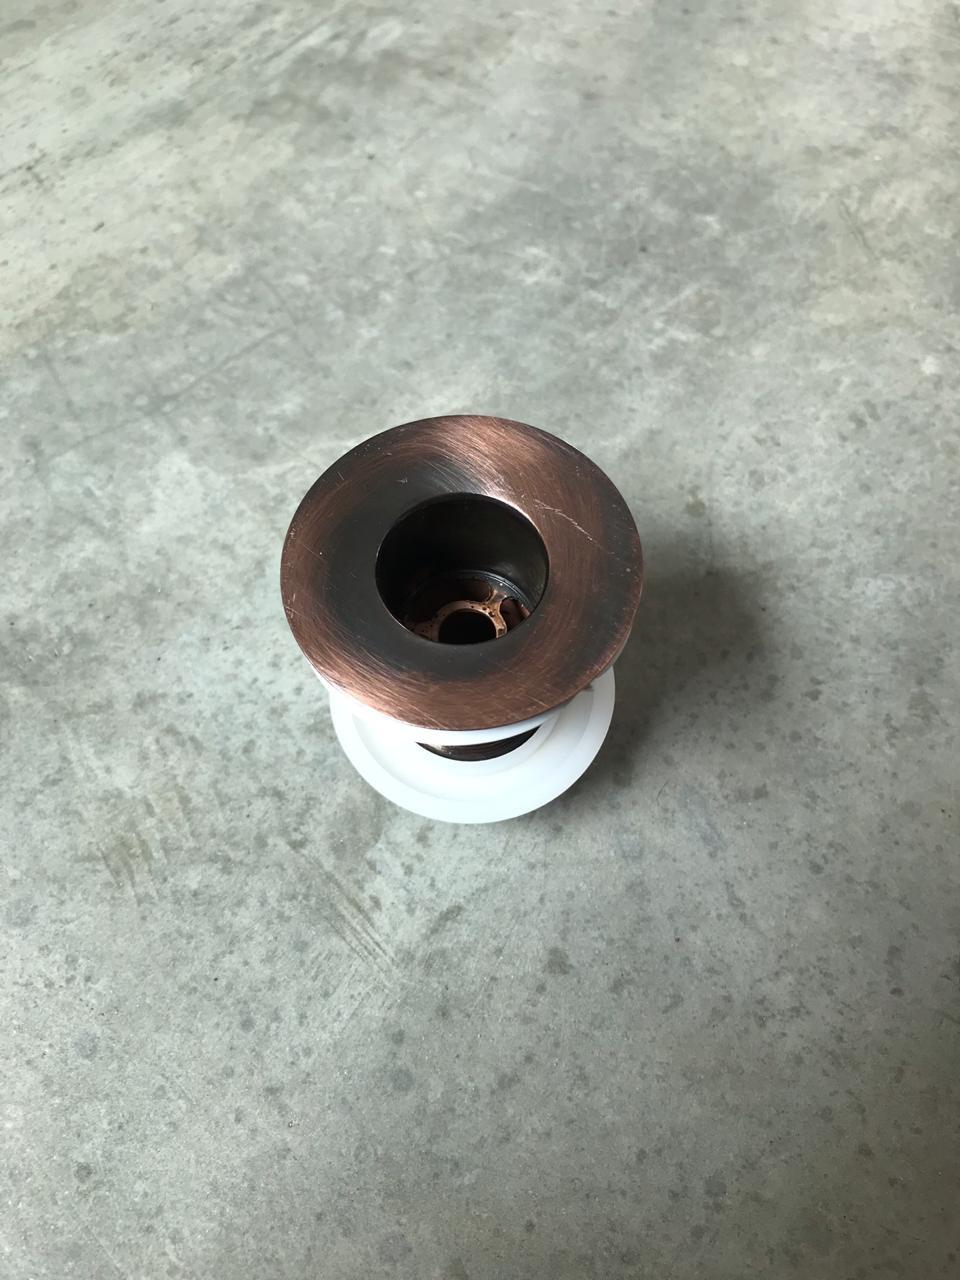 Foto 1 - Válvula para cuba em liga de cobre